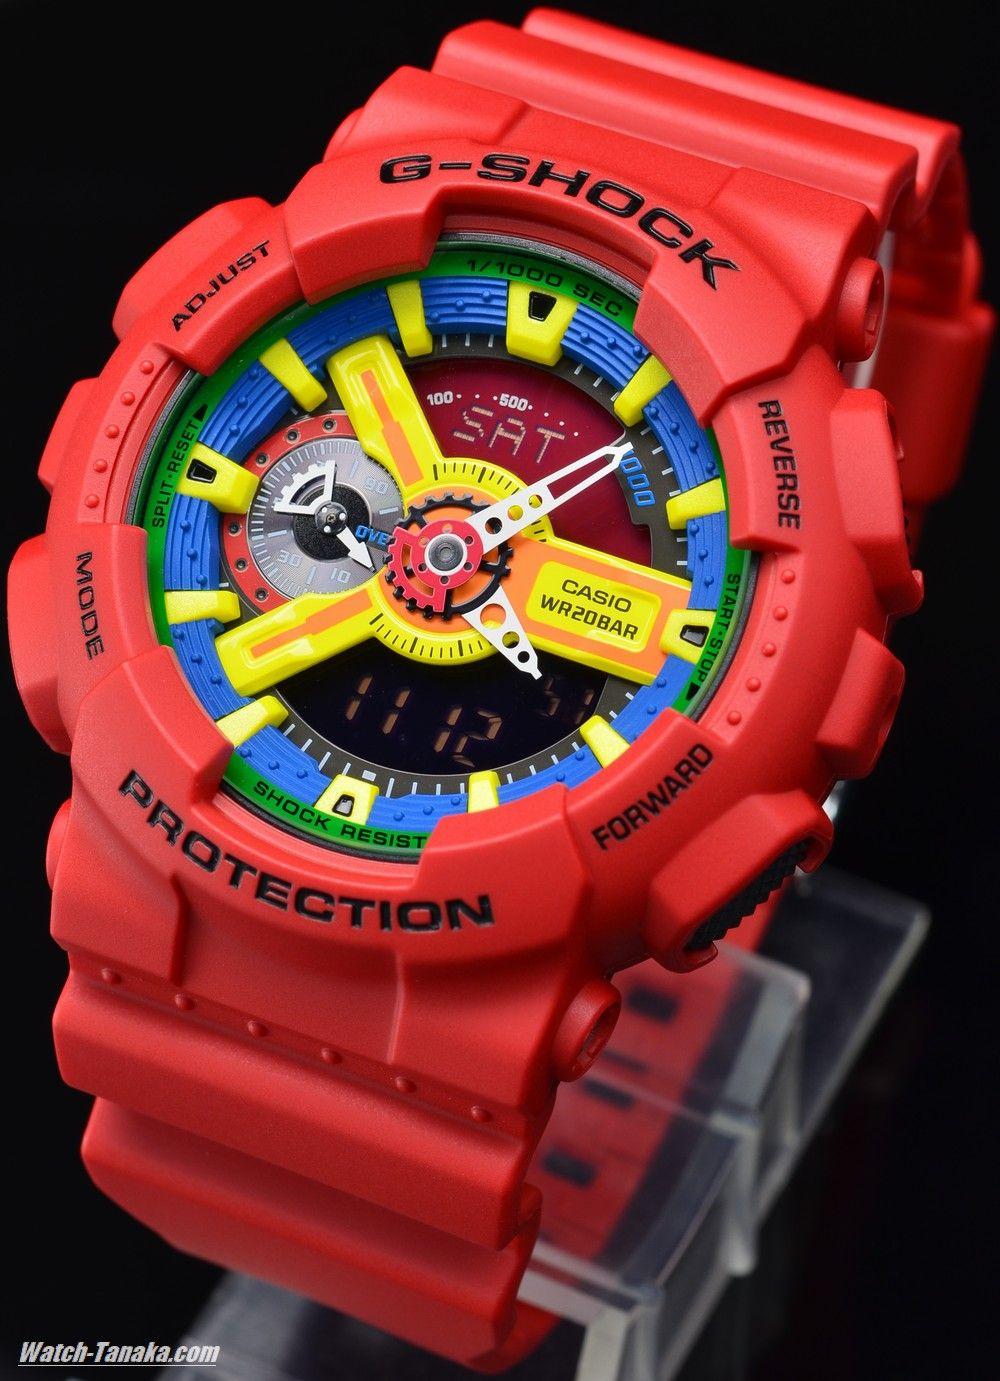 CASIO G-SHOCK Crazy Colors GA-110FC-1AJF クレイジーカラーズ  bea0140fef